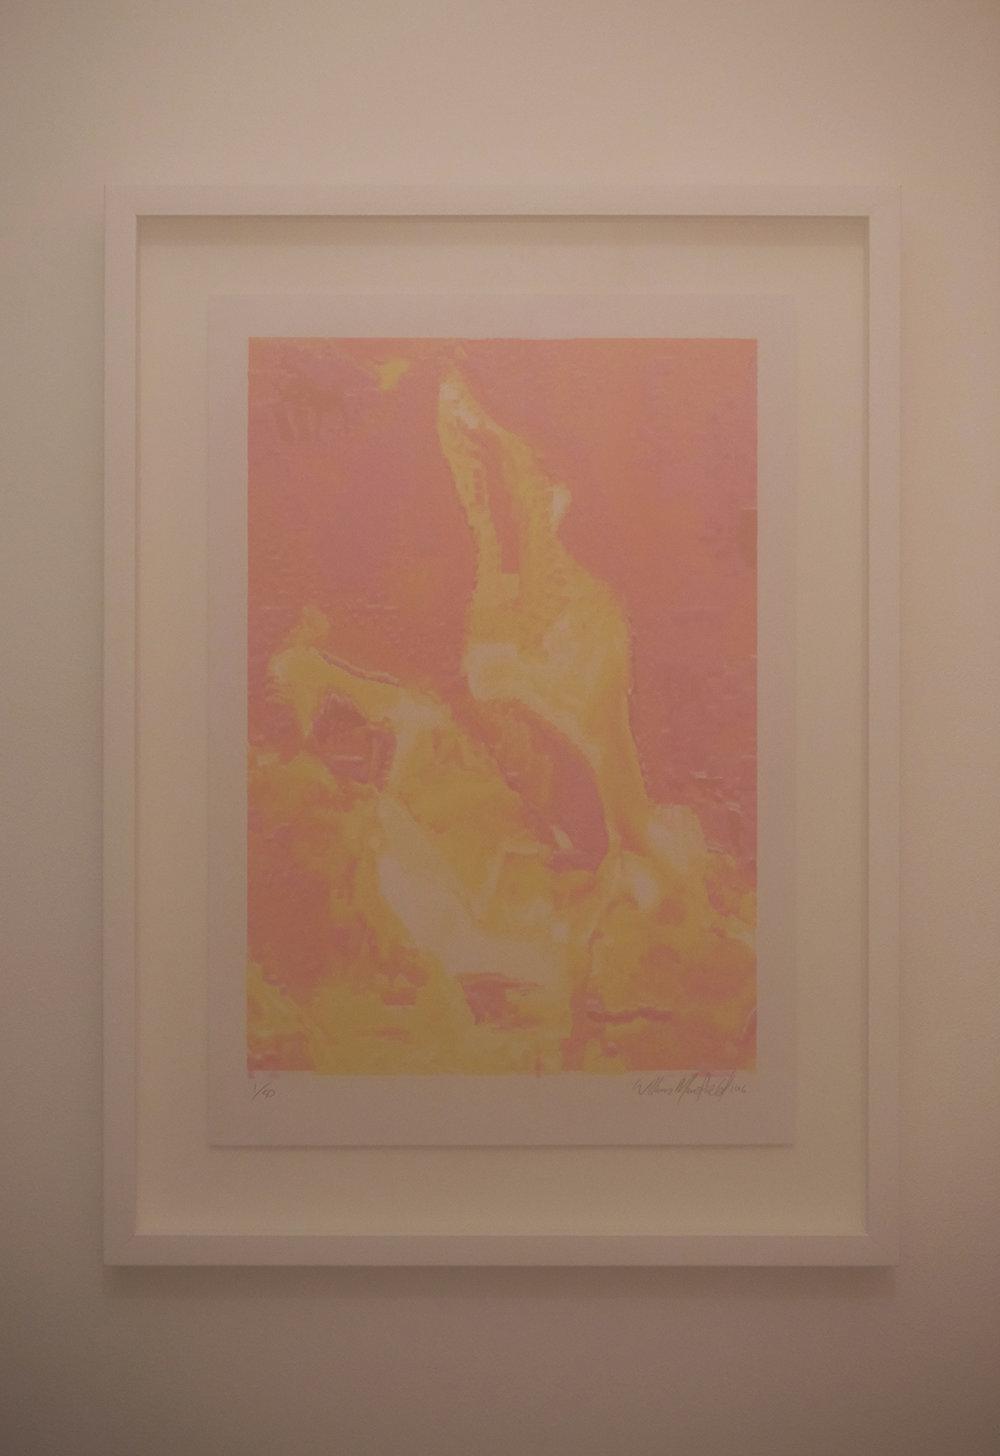 FirstdraftMay16-inferno-photo-by-zan-wimberley-05.jpg